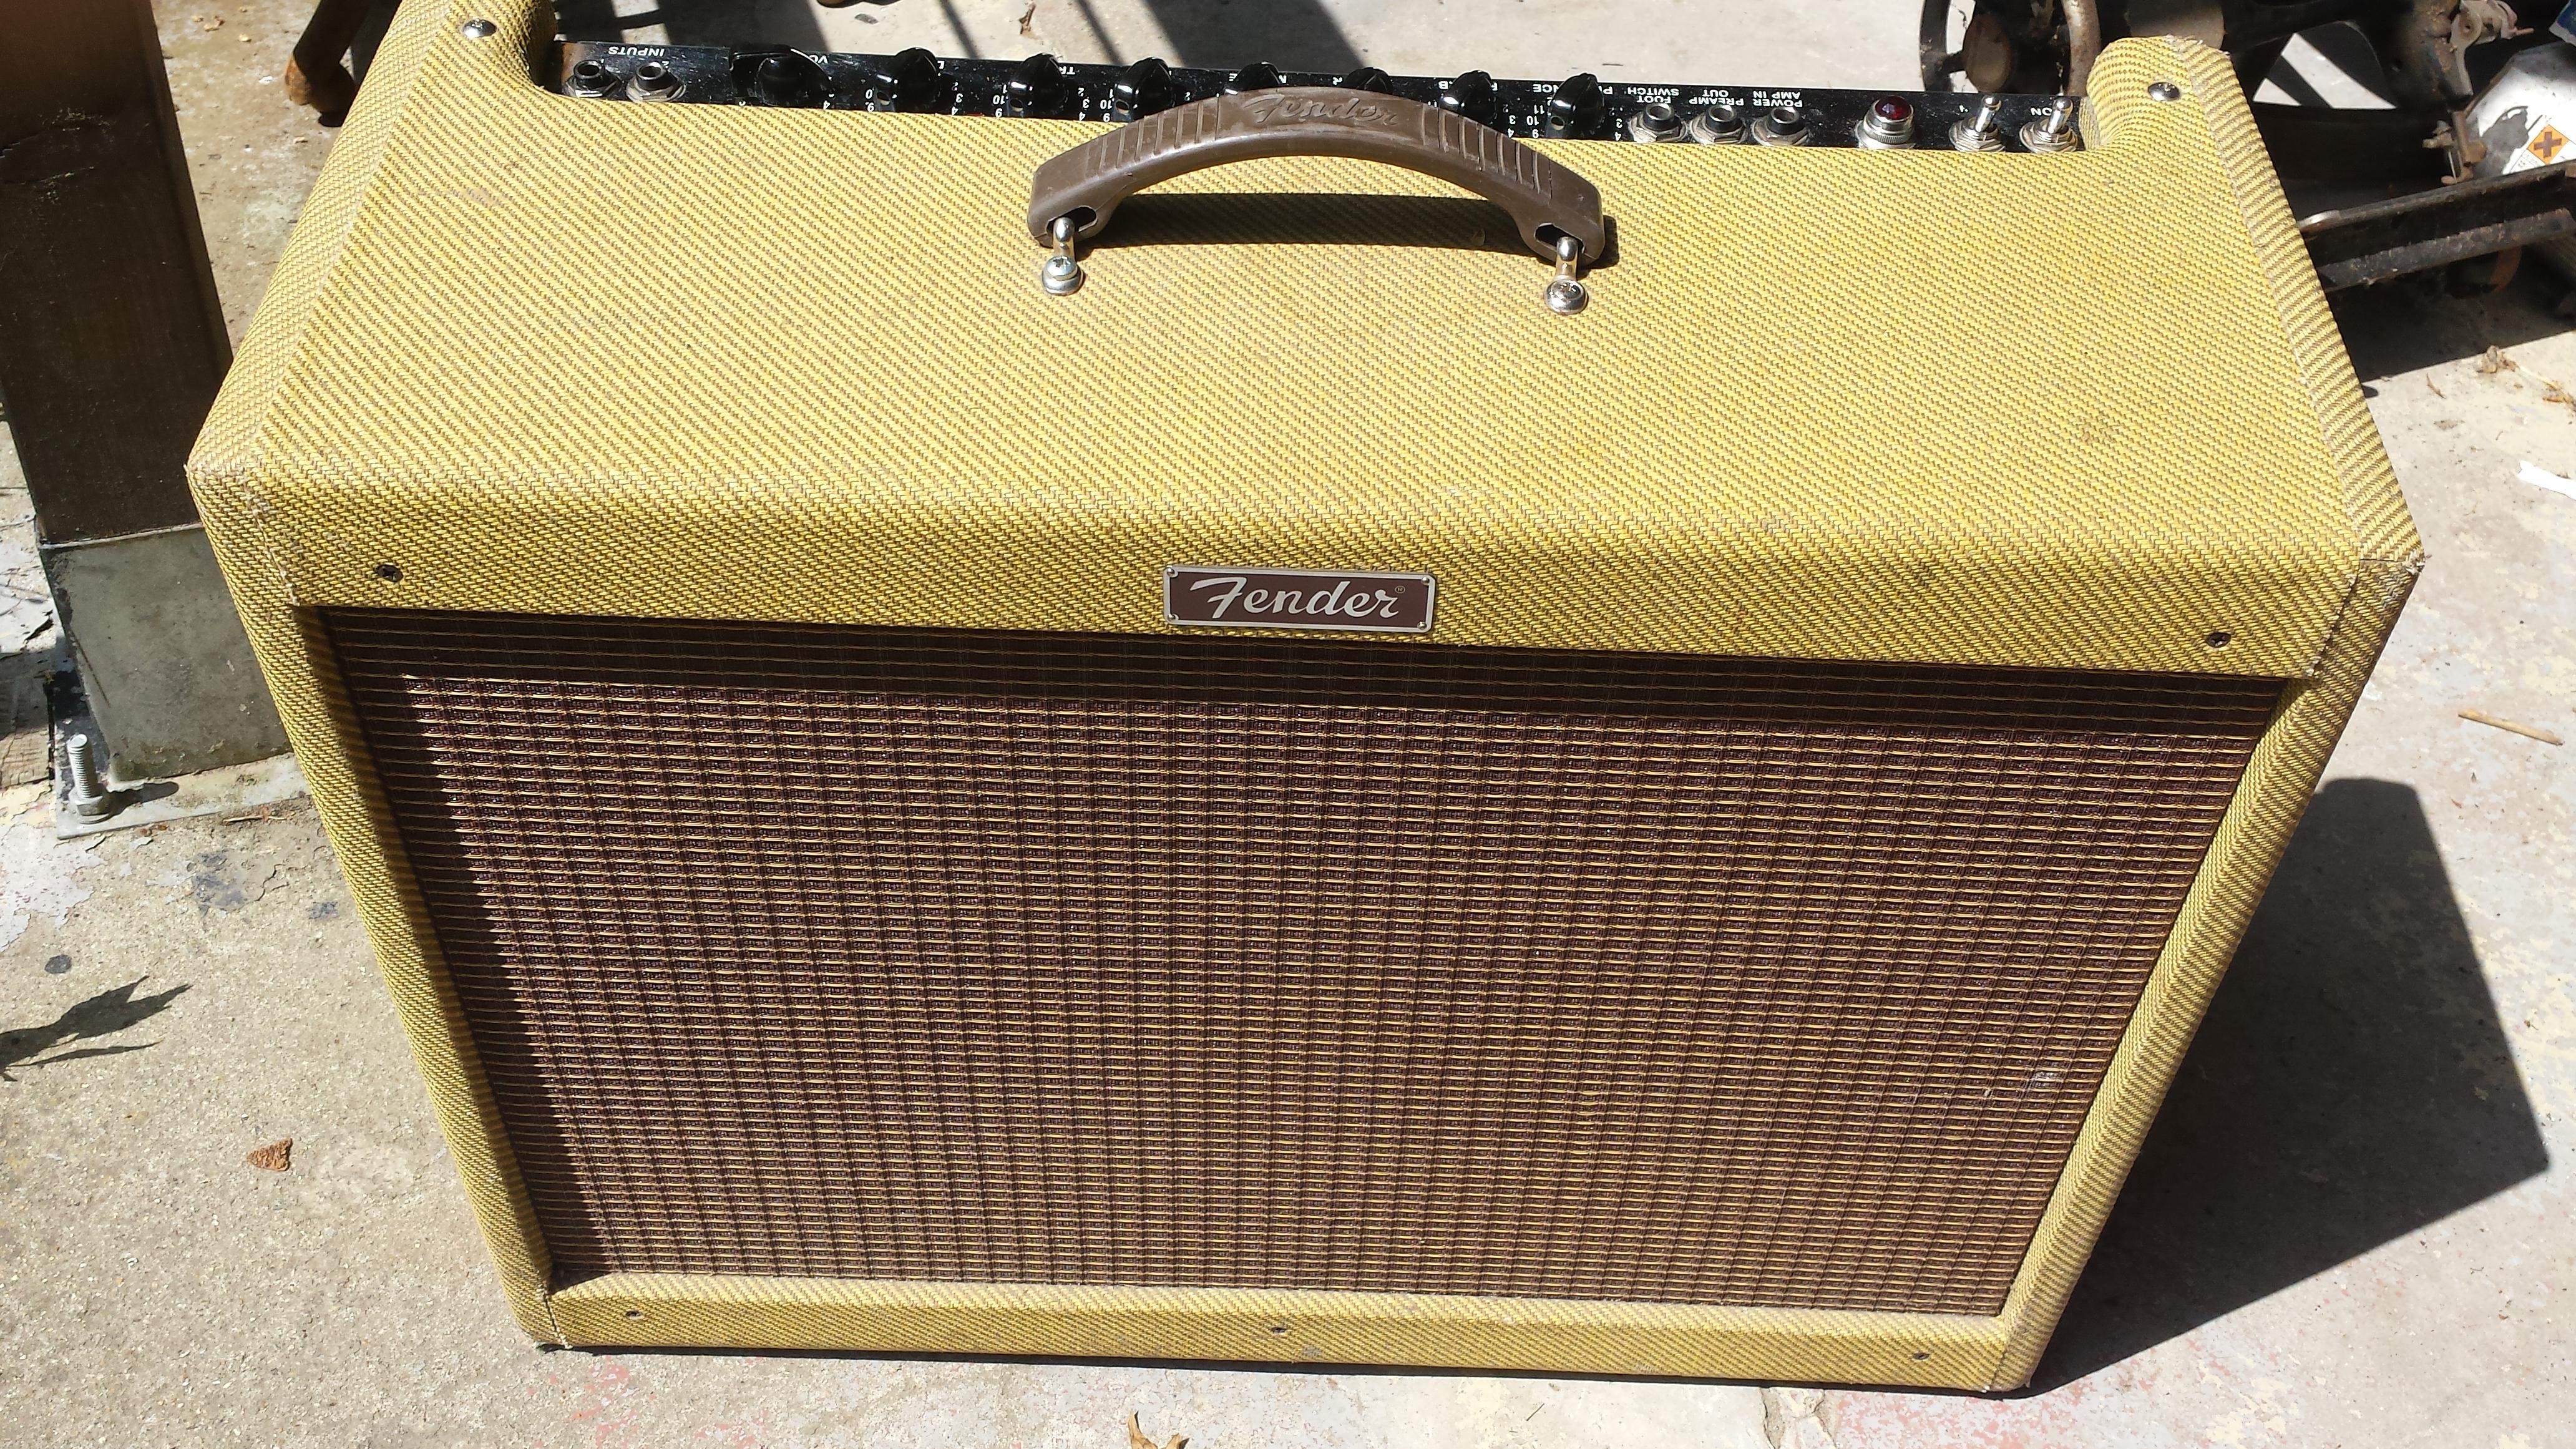 Fender Blues Deluxe 1994 1996 Image 1799551 border=